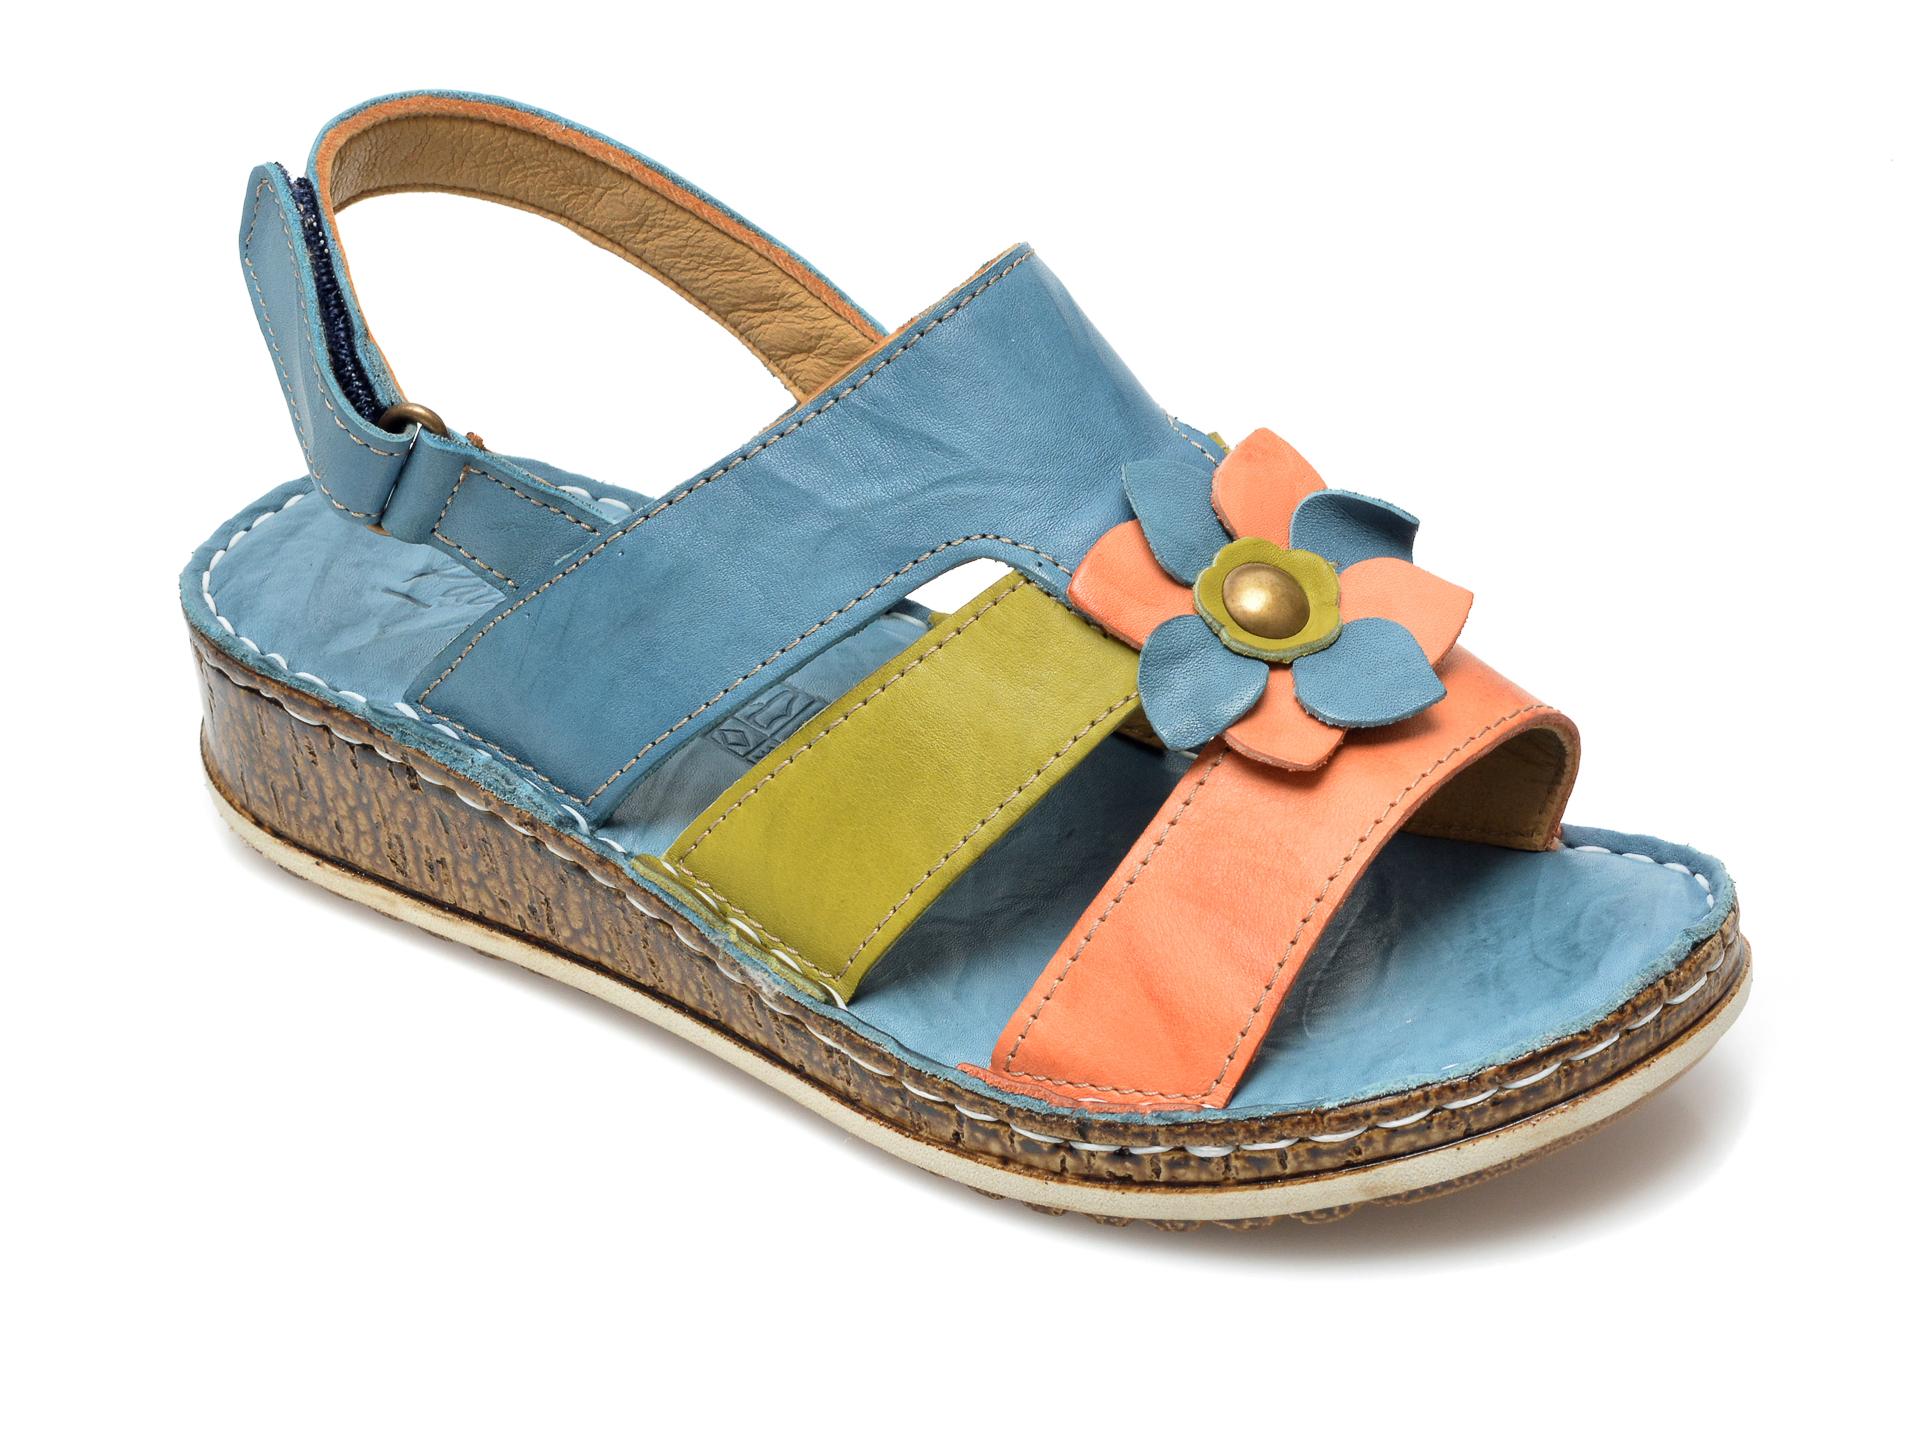 Sandale PAVARELLA albastre, 1339, din piele naturala imagine otter.ro 2021